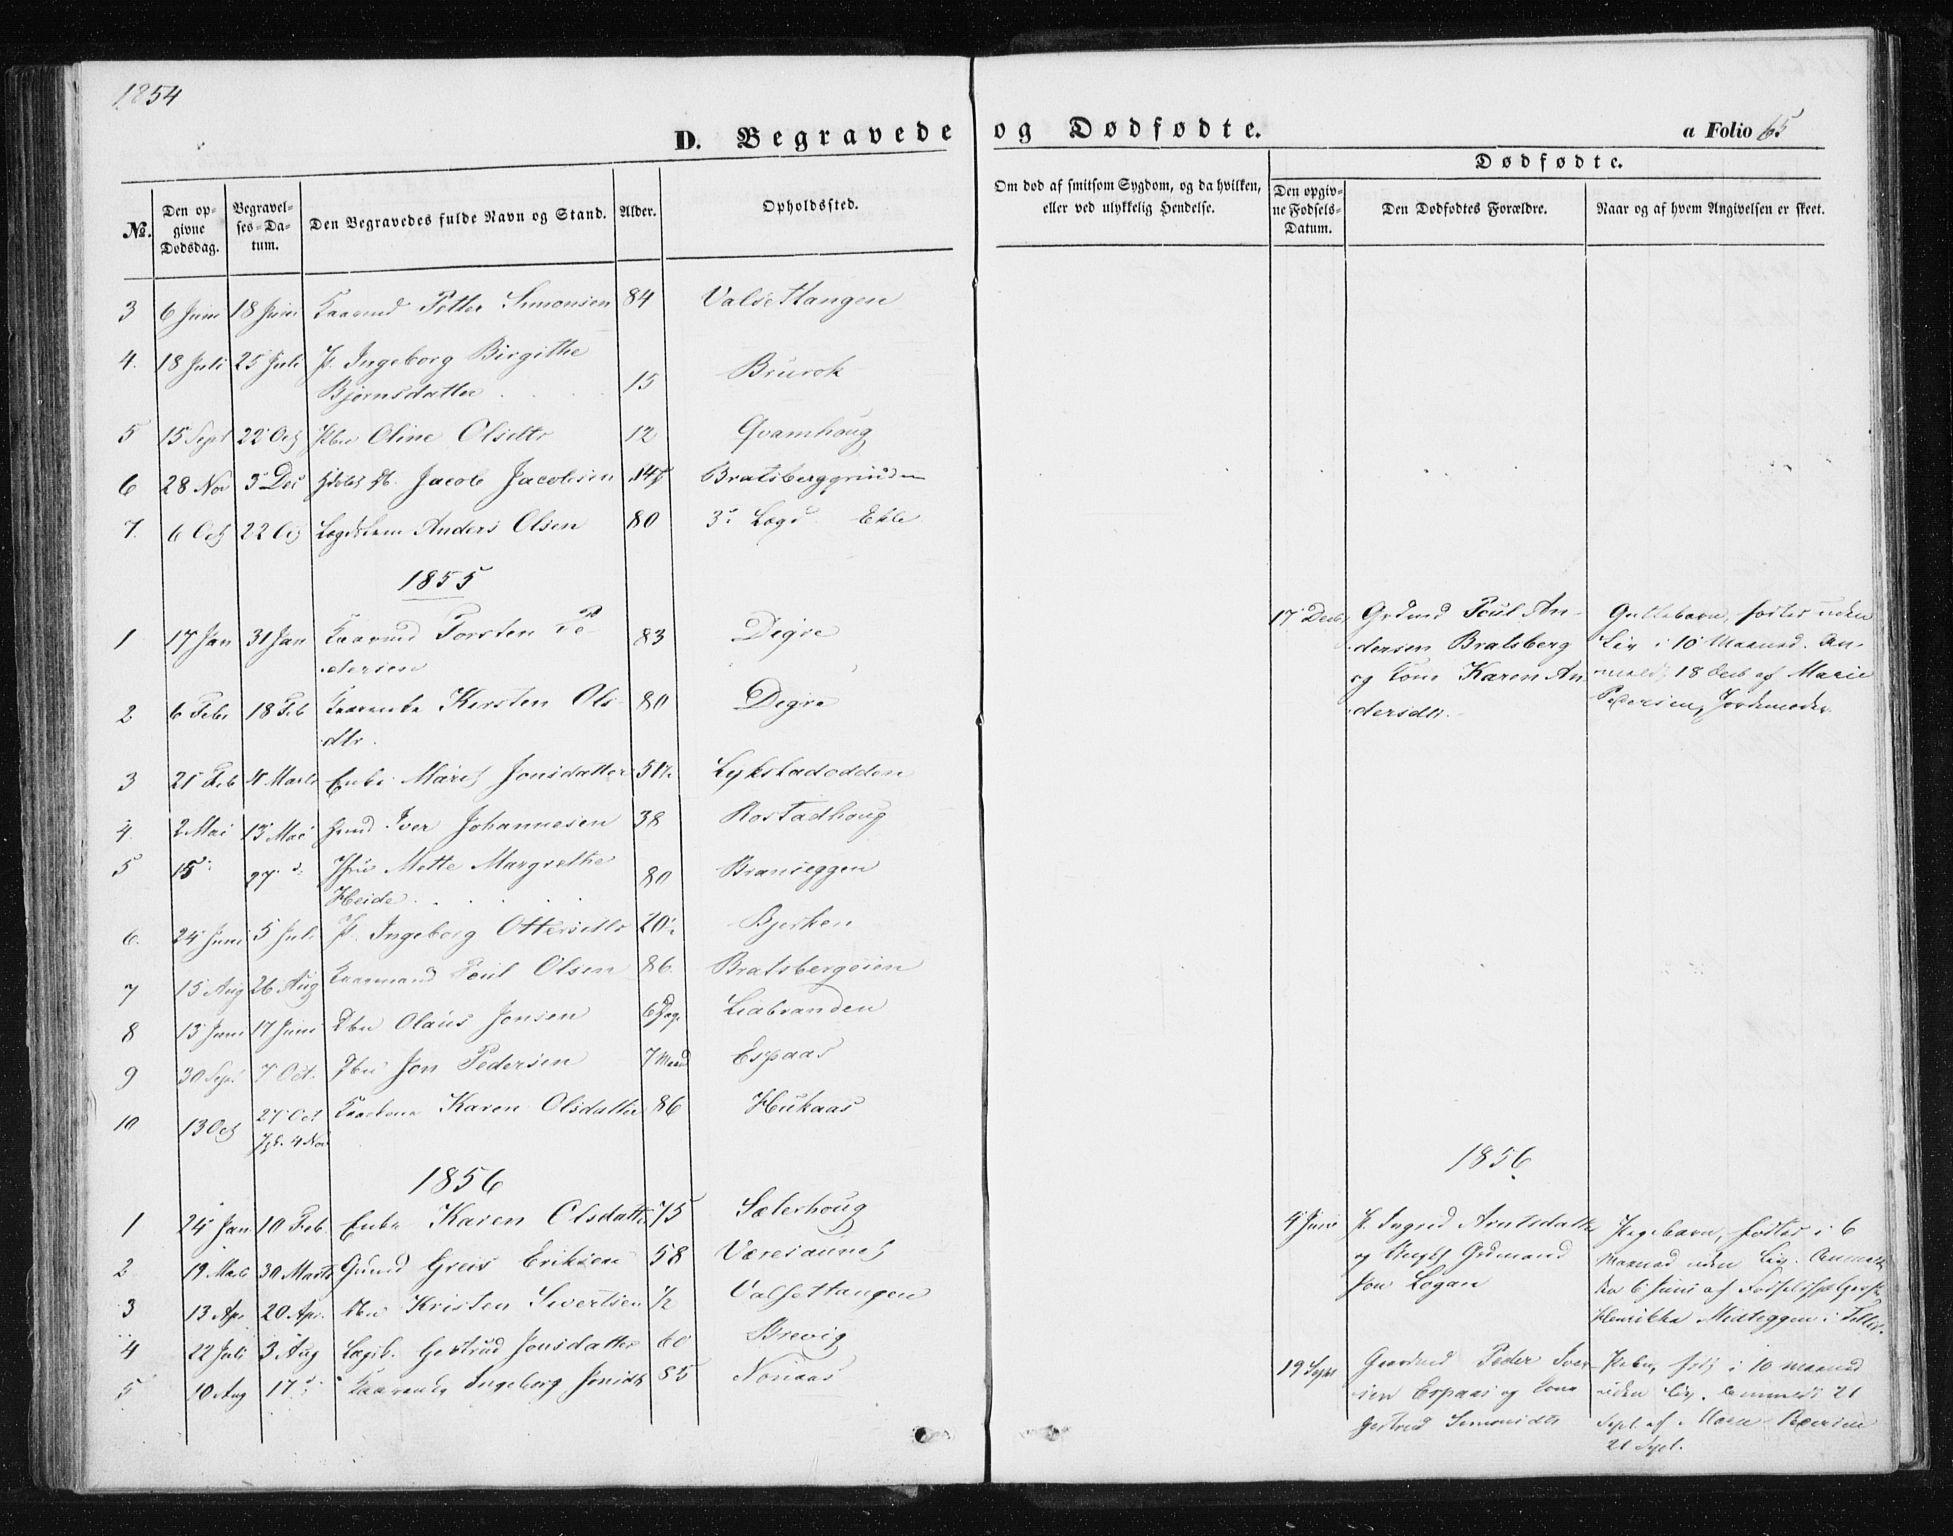 SAT, Ministerialprotokoller, klokkerbøker og fødselsregistre - Sør-Trøndelag, 608/L0332: Parish register (official) no. 608A01, 1848-1861, p. 65